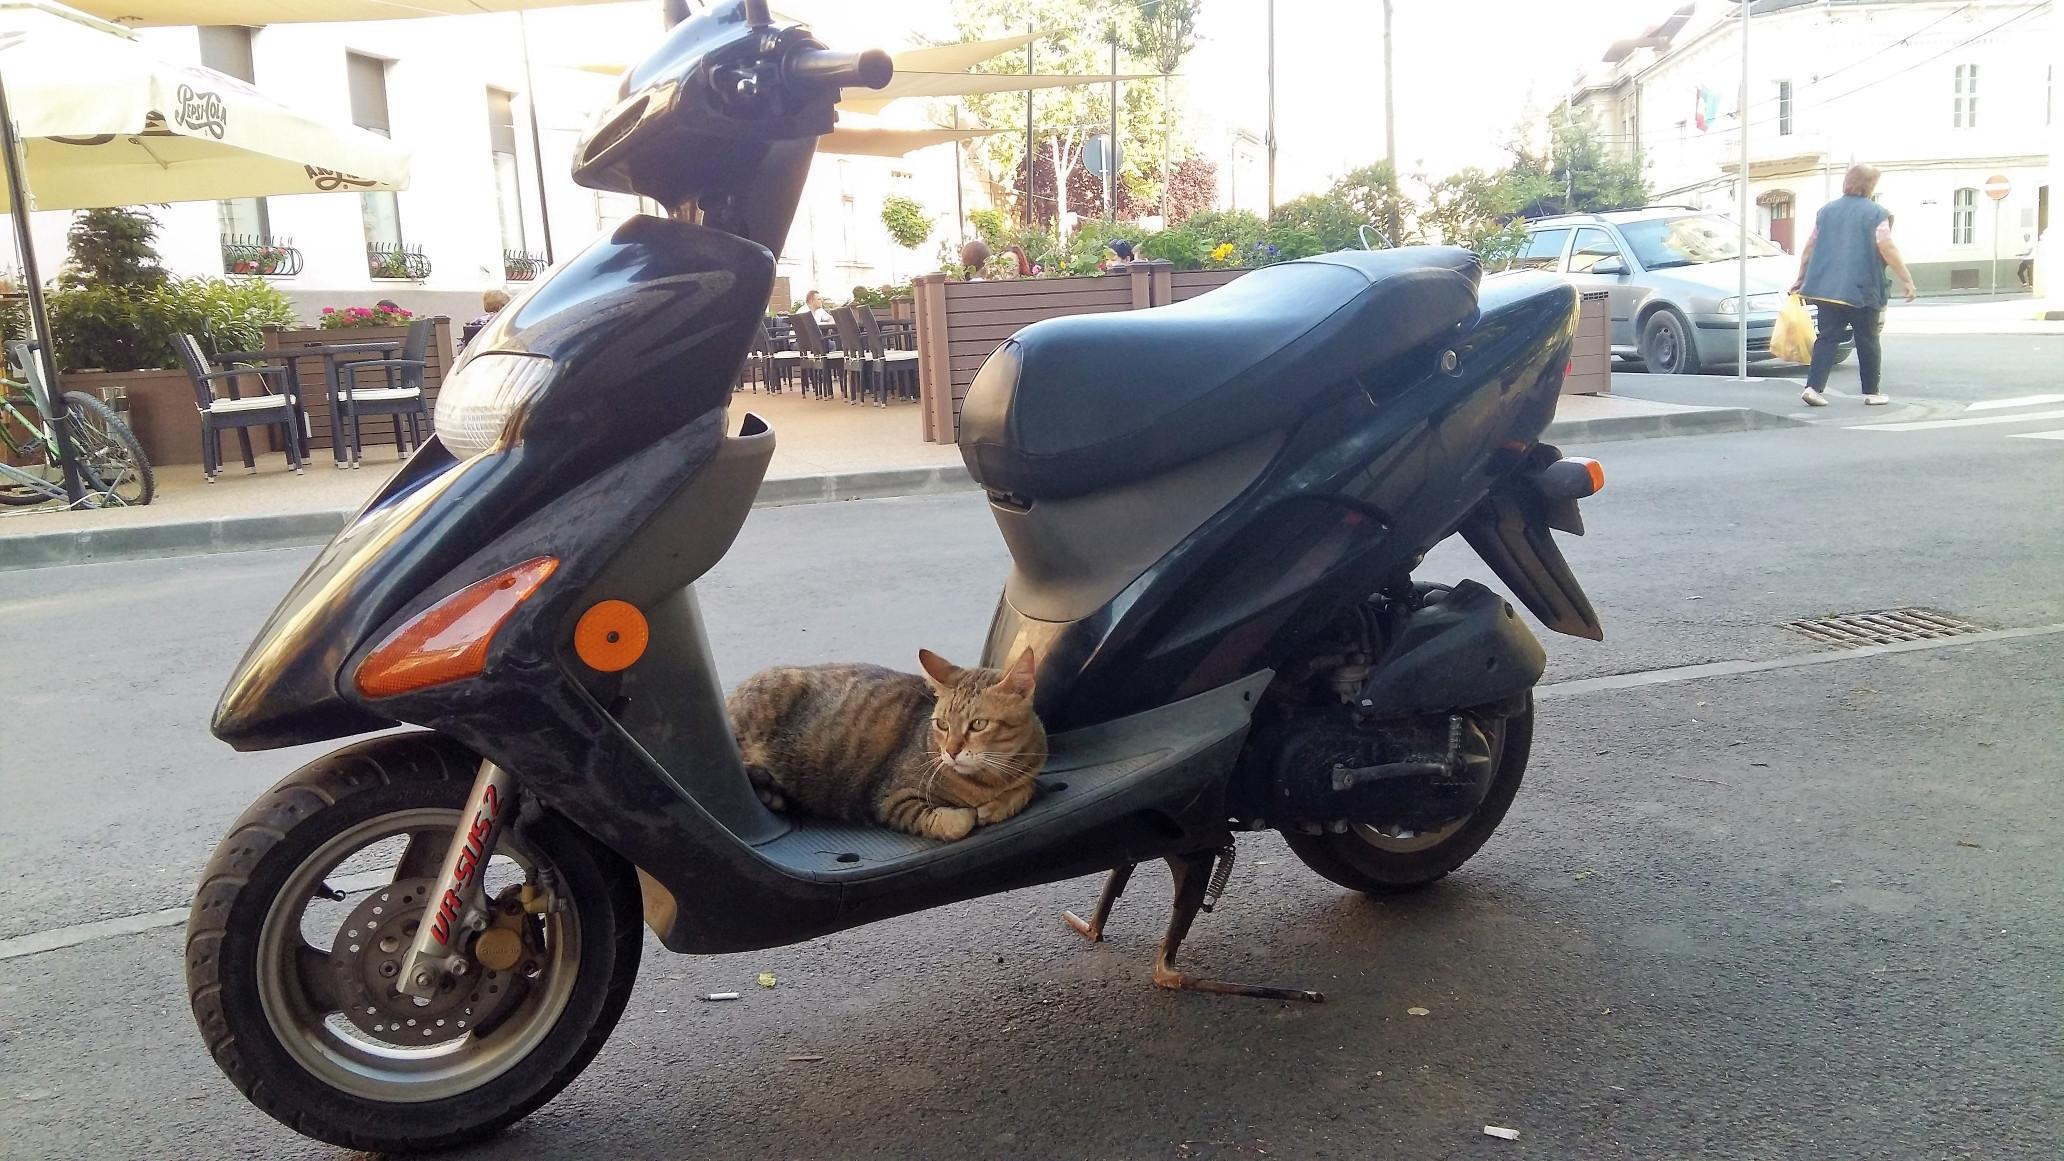 szeghalmi_ors_easy_rider.jpg